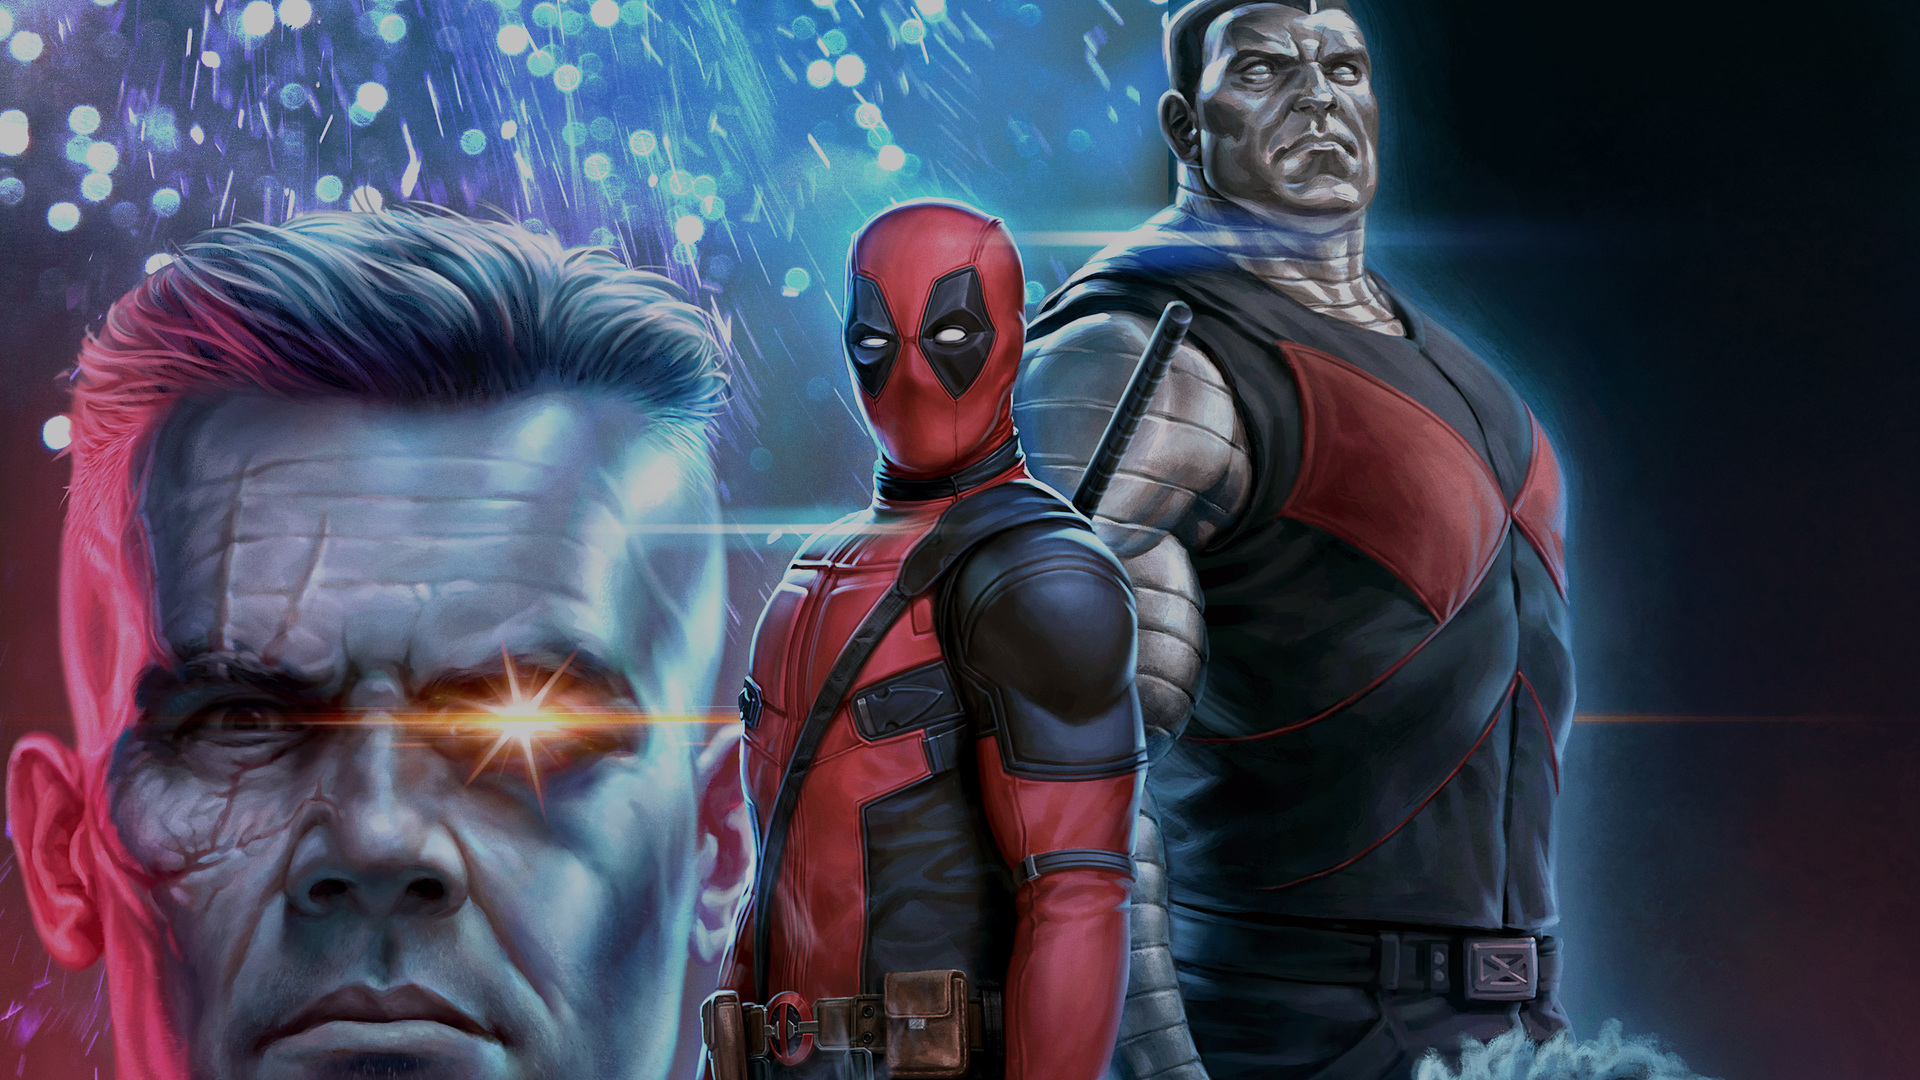 1920x1080 deadpool 2 poster laptop full hd 1080p hd 4k - Deadpool download 1080p ...